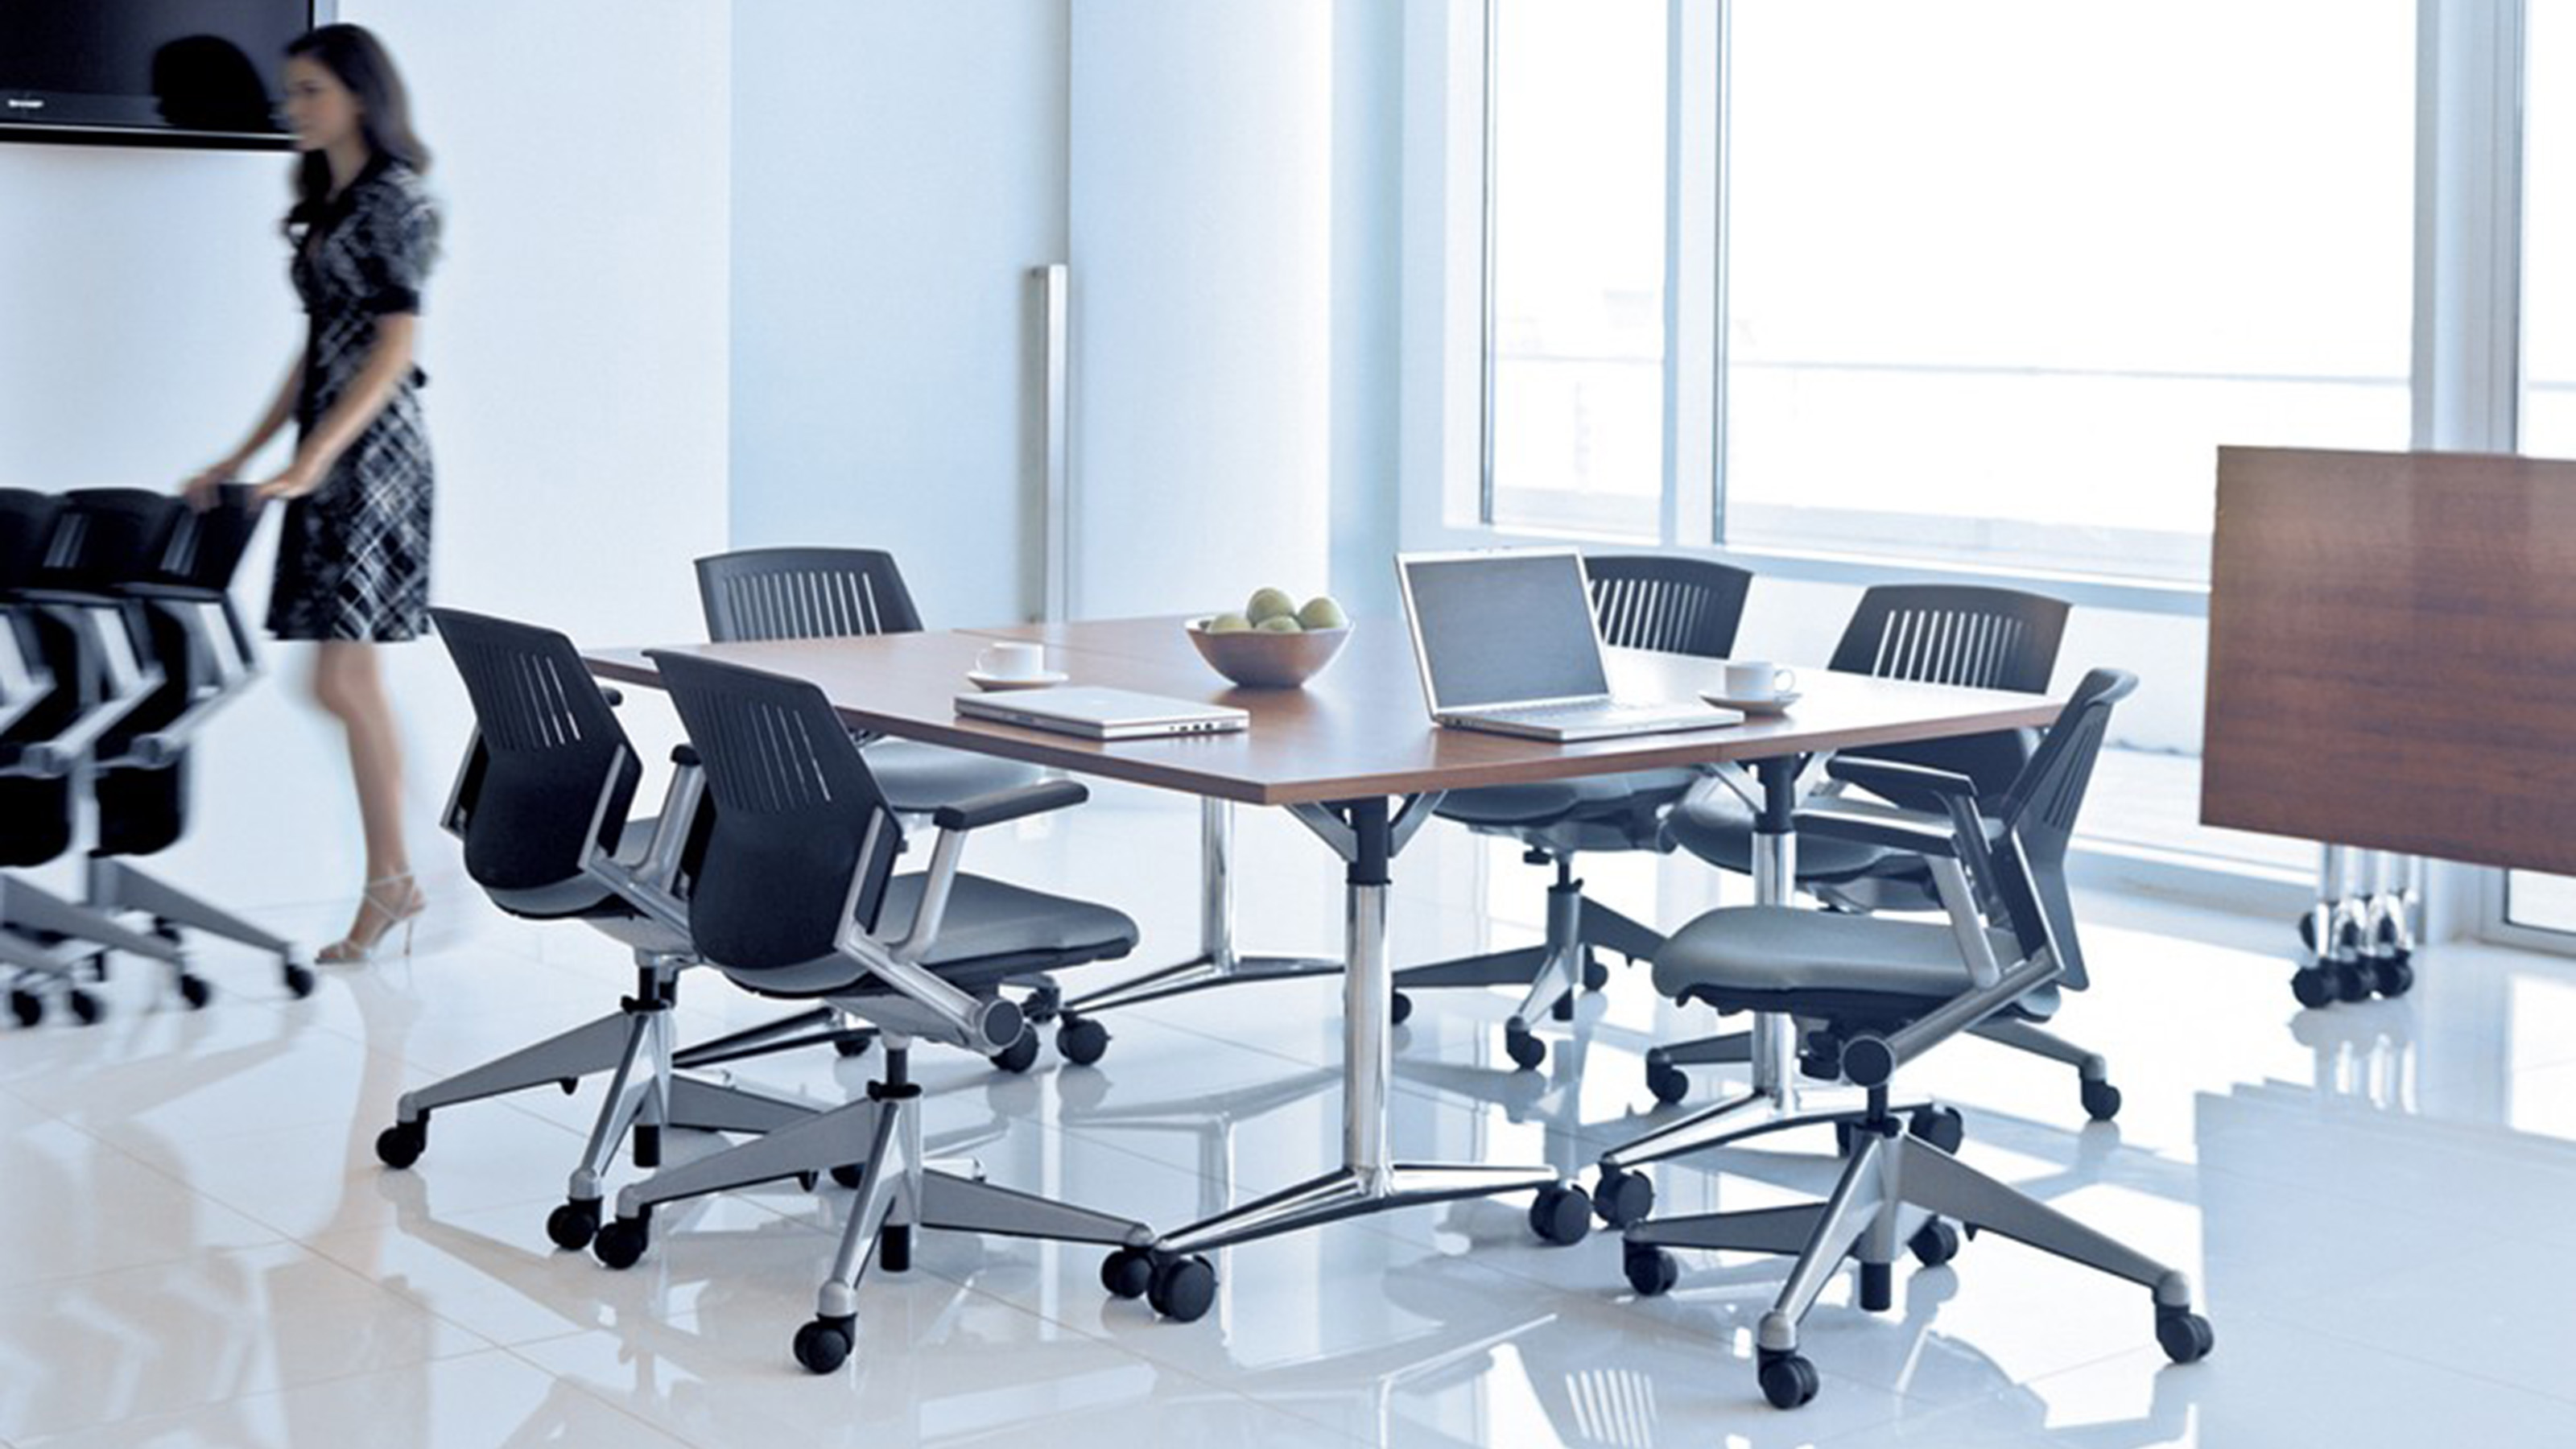 office tables on wheels. Office Tables On Wheels. Wheels . O